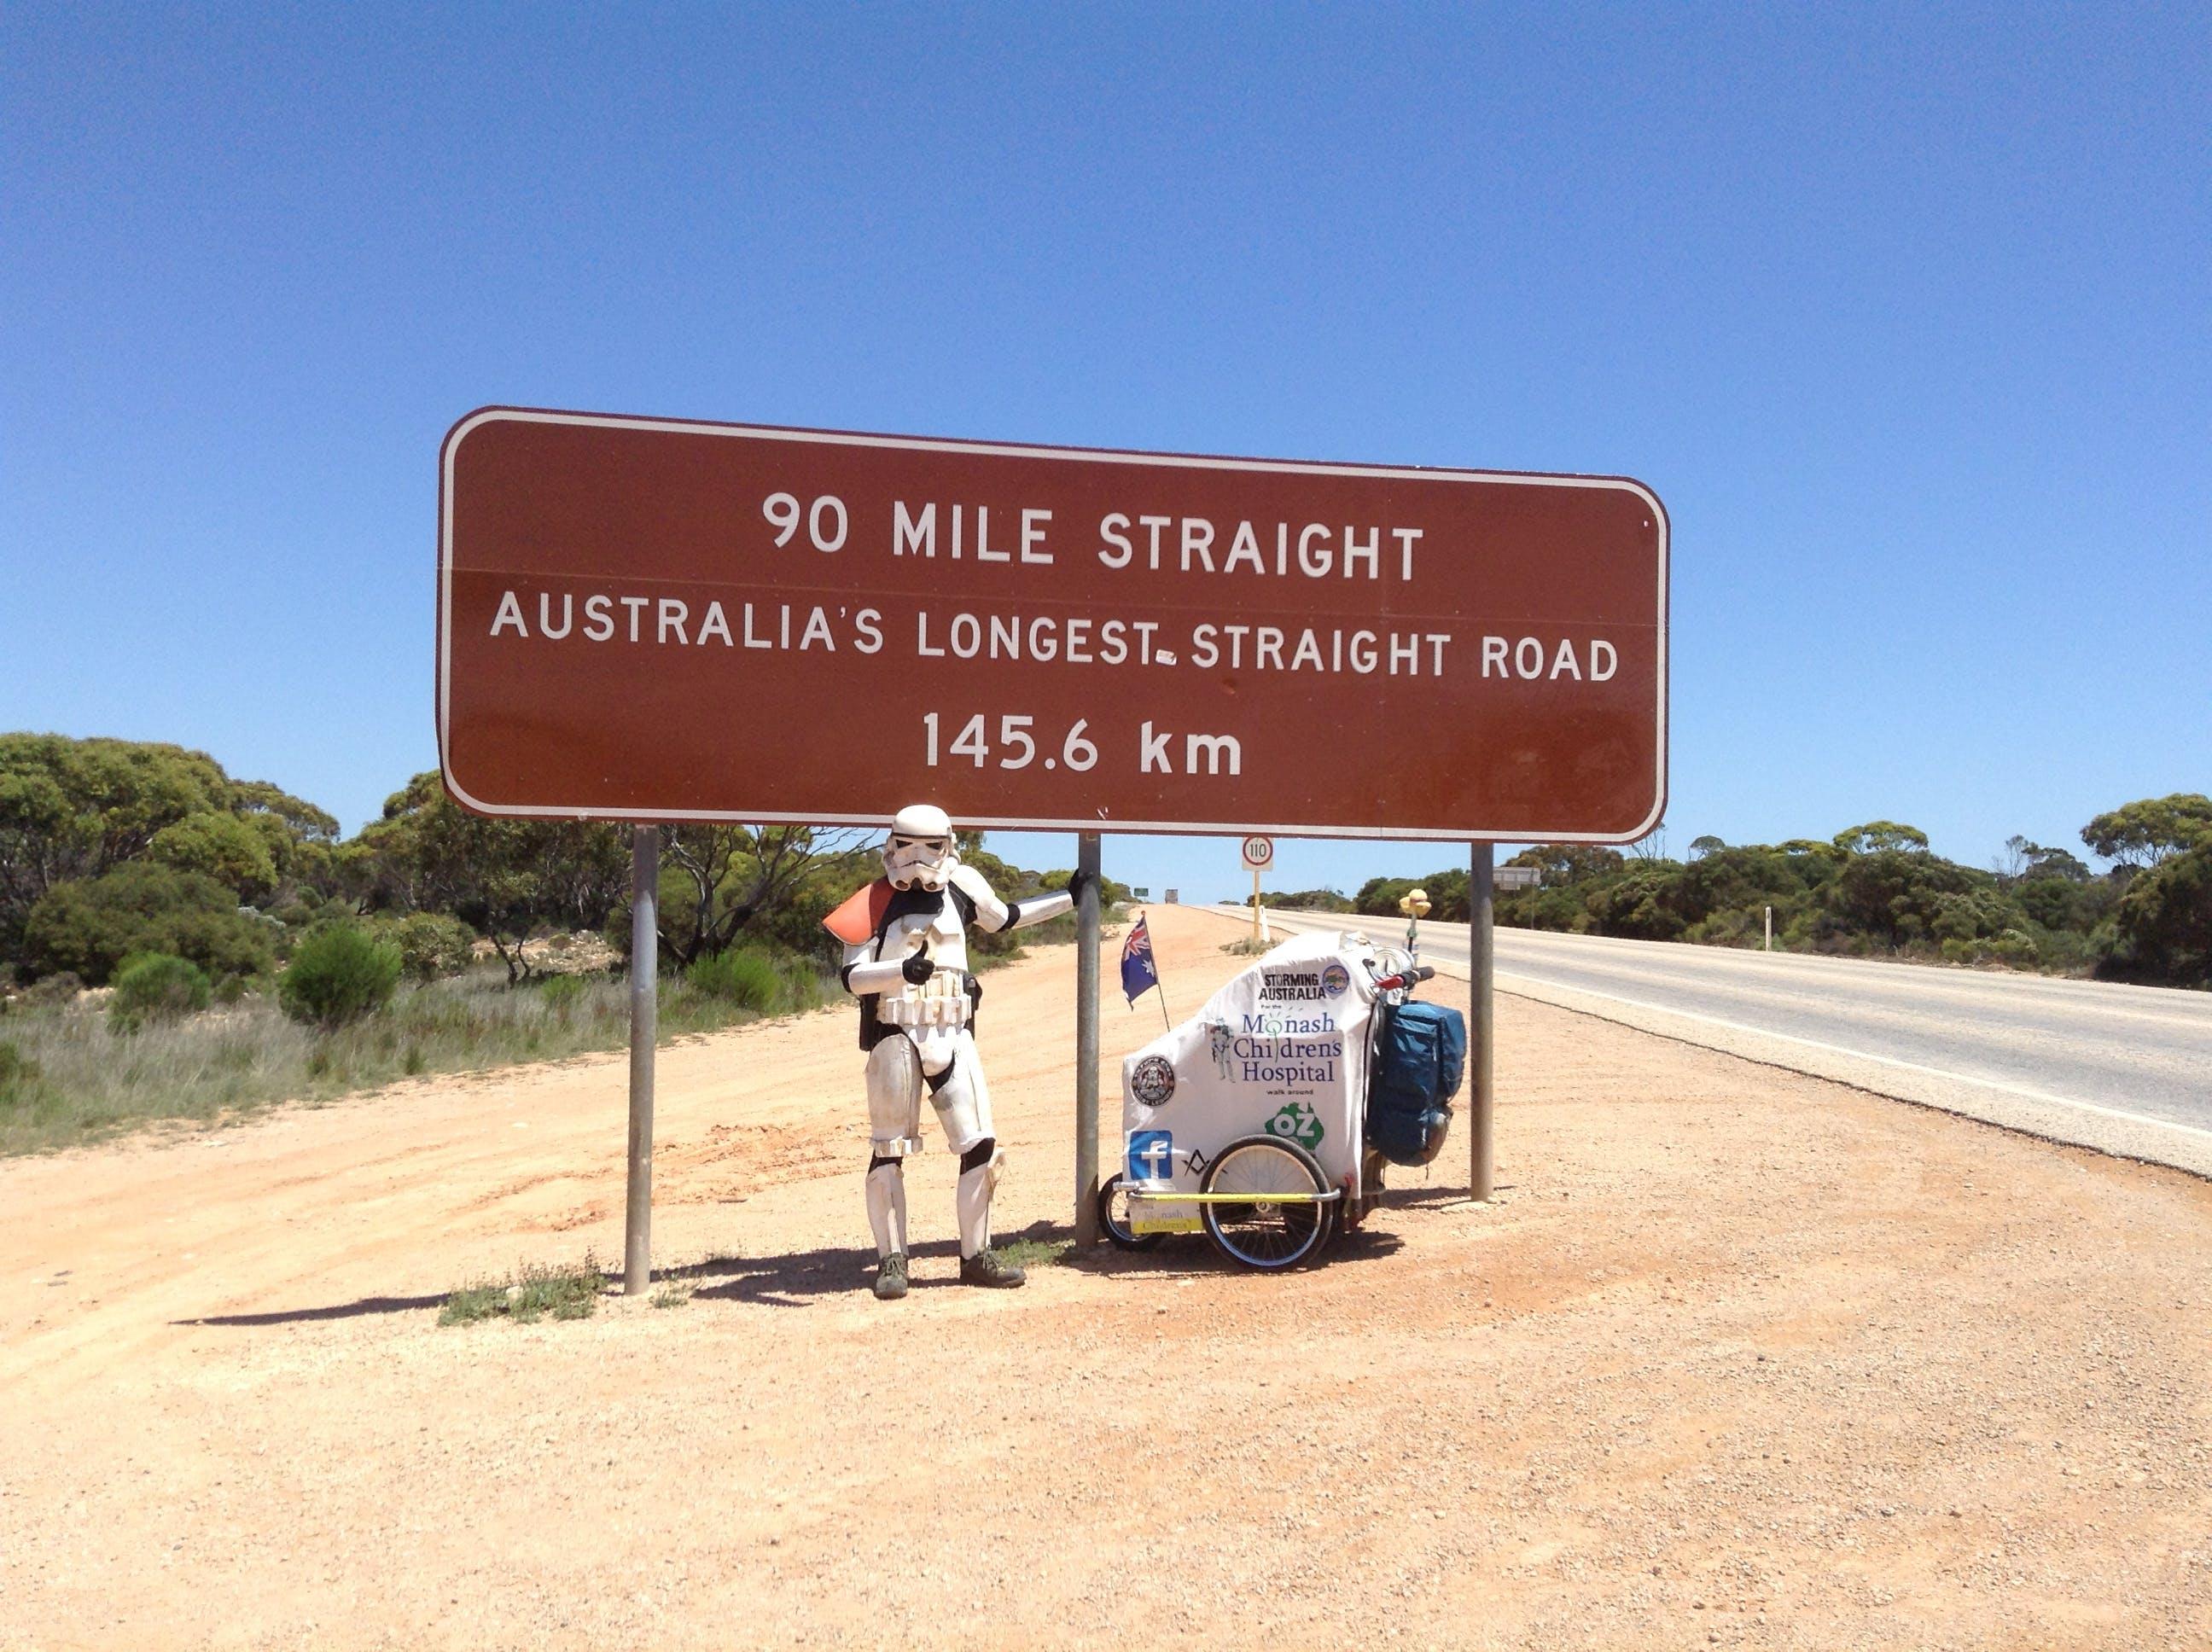 Australia enters the Space Age